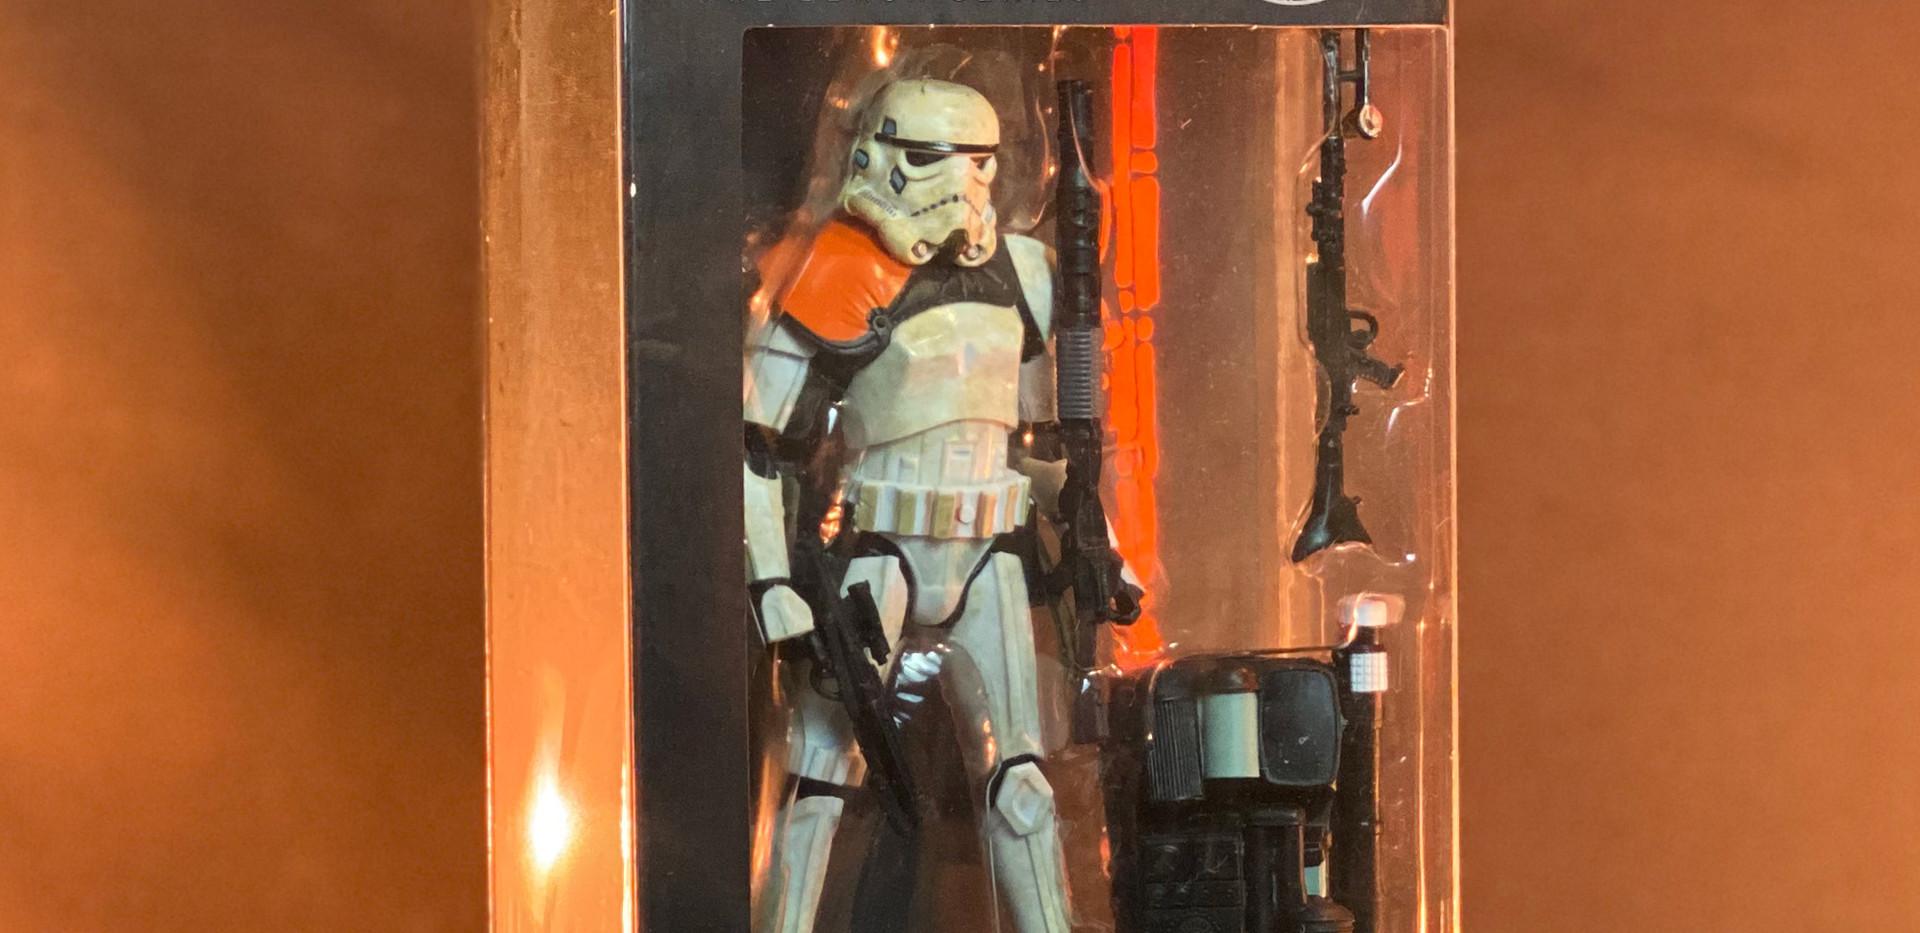 DFR-1-OrangeBlue-Glam-Shots-Sandtrooper1